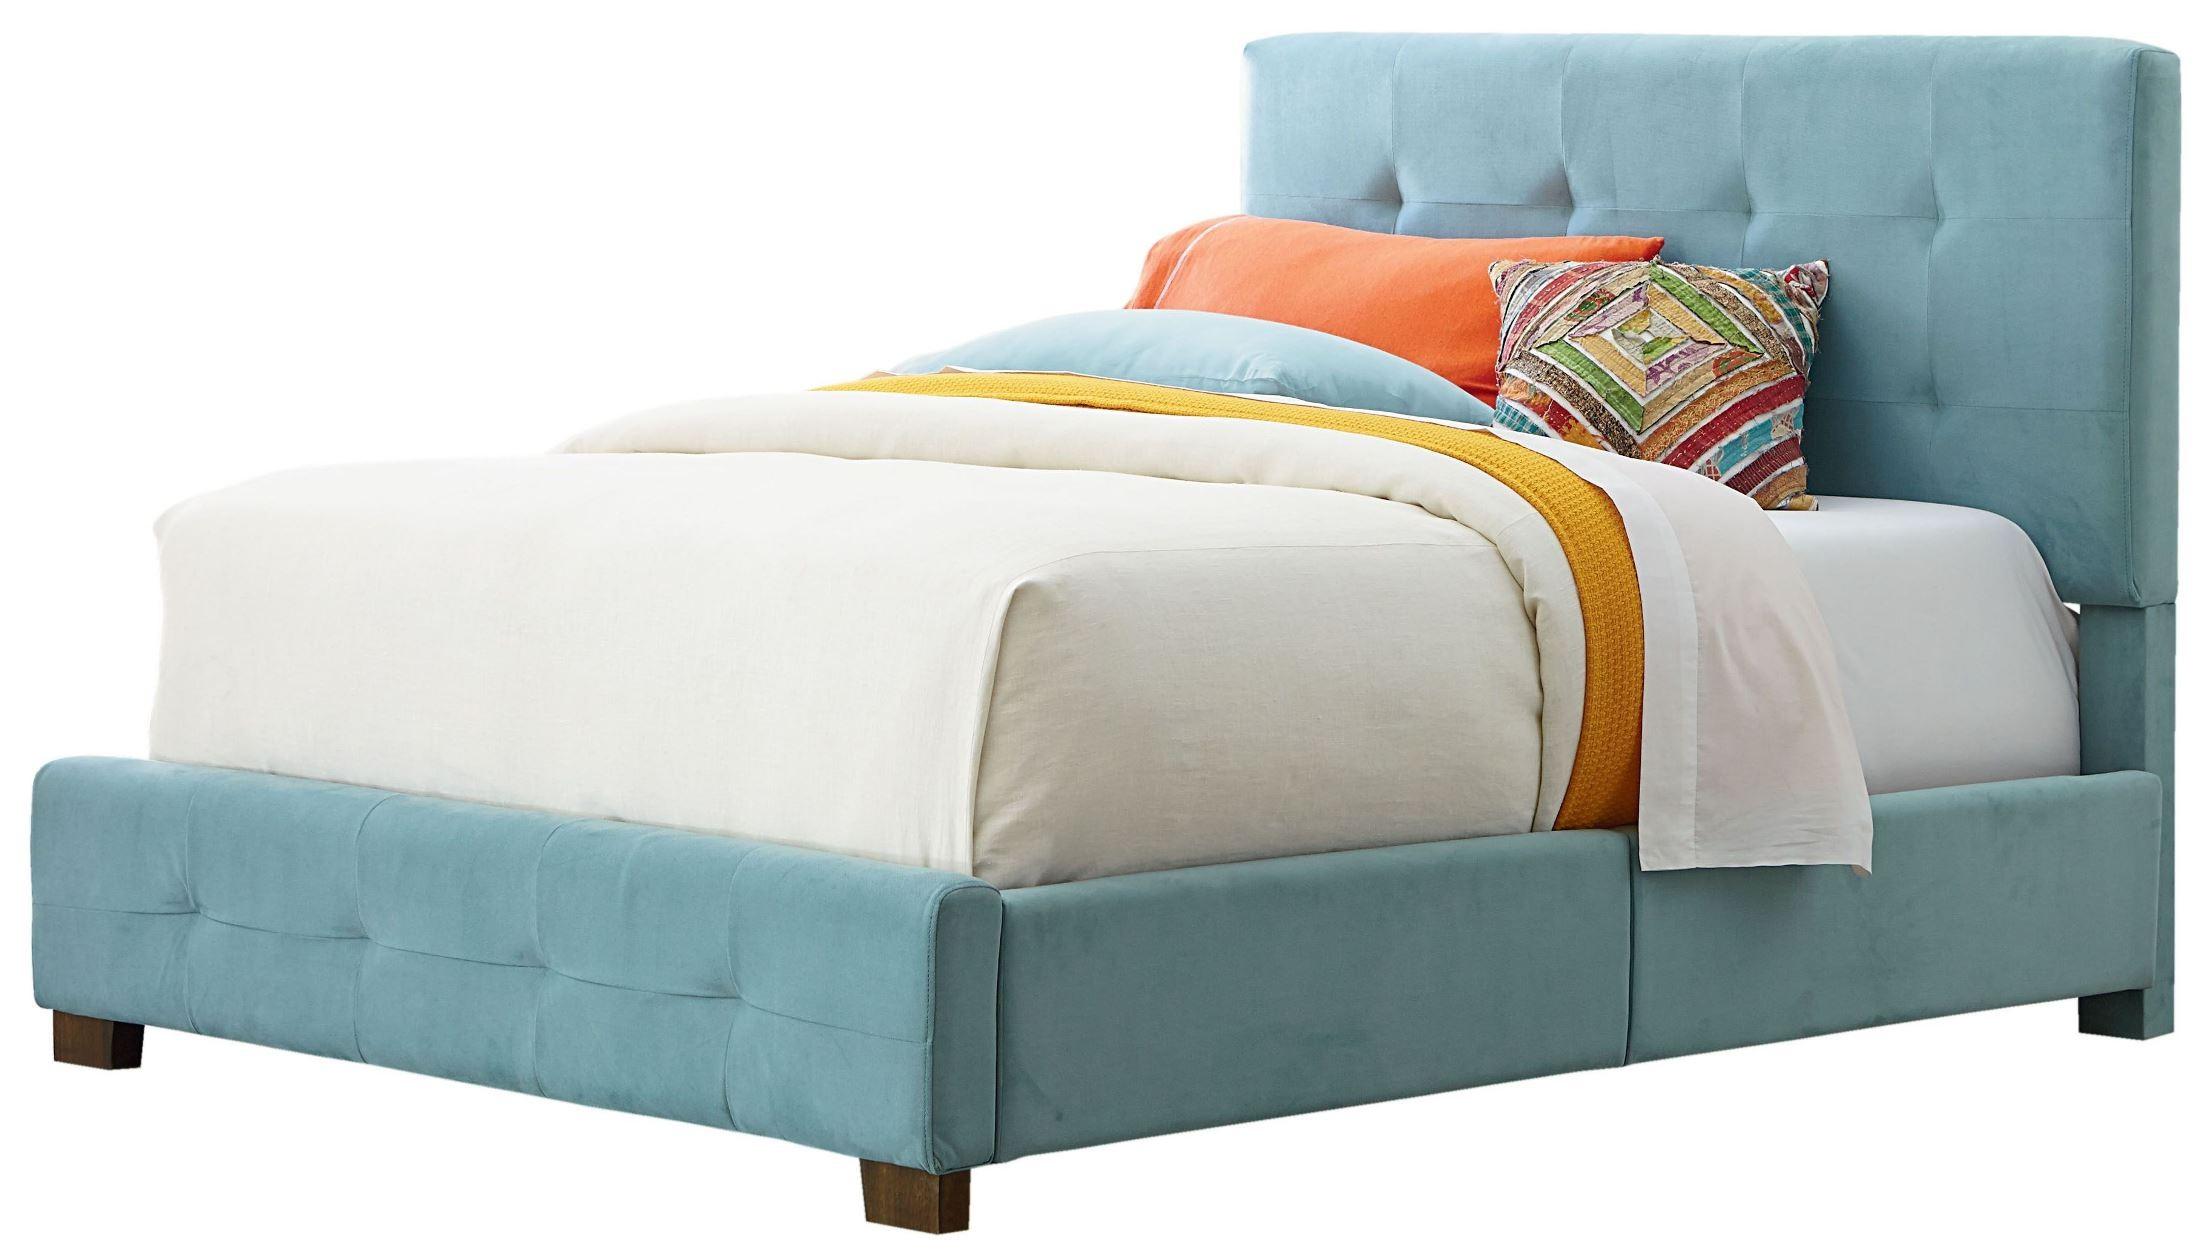 Madison blue full upholstered bed from standard furniture for Upholstered full bed